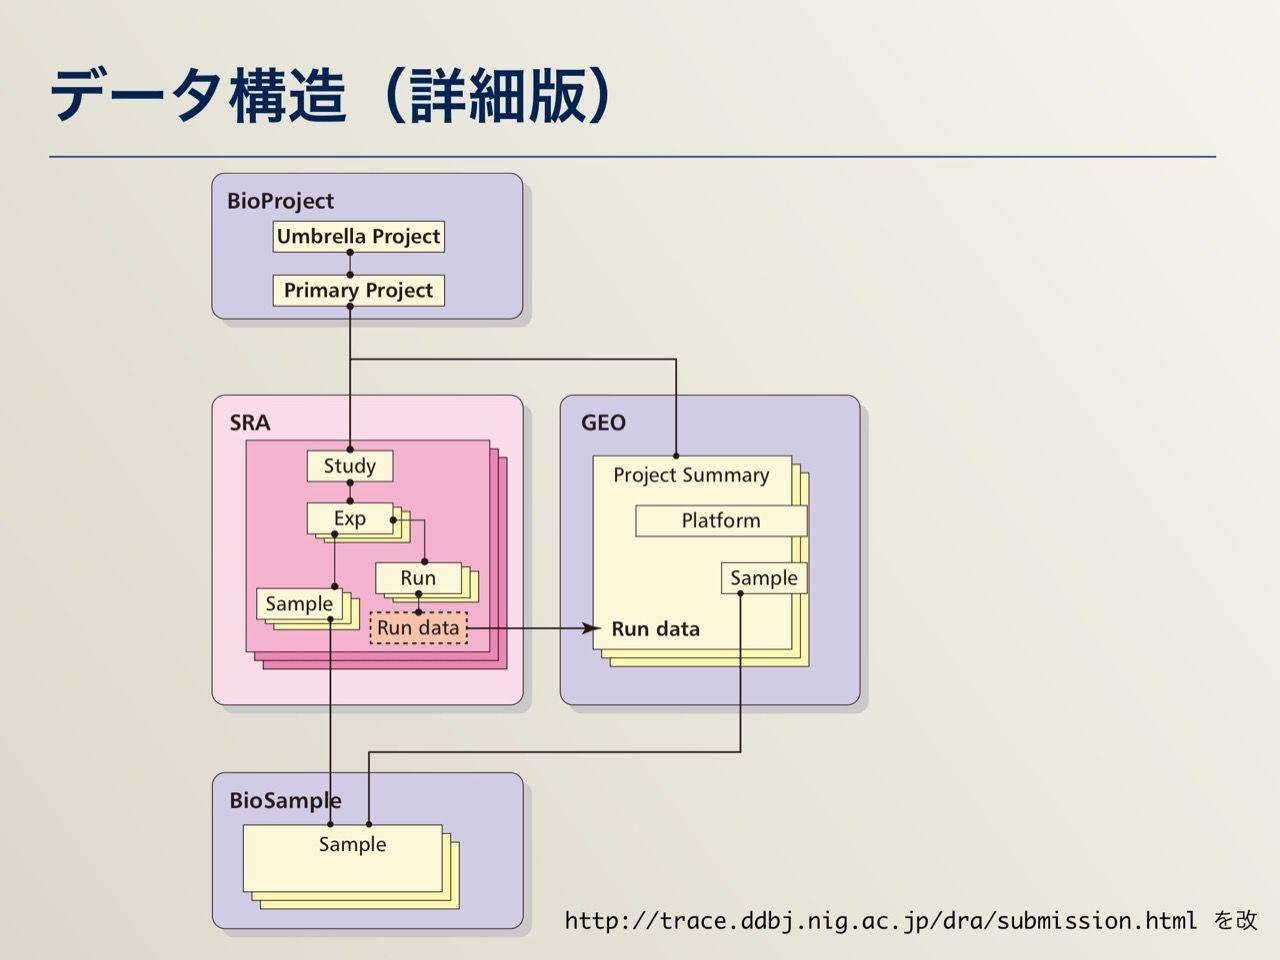 images/AJACS64_03_nakazato_023.jpg